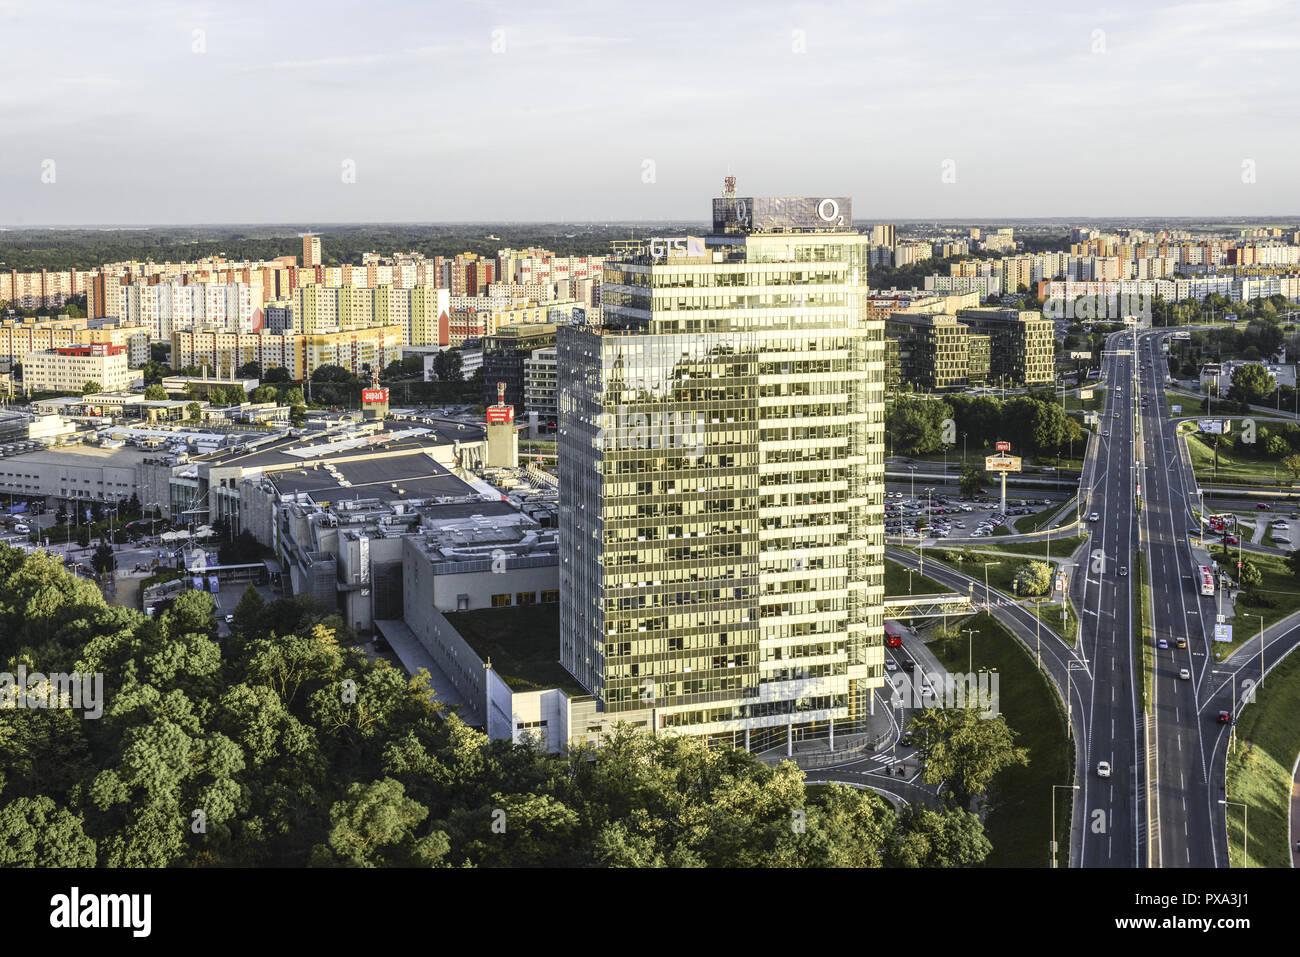 Bratislava, Petrzalka, Aupark, Slovak Republic, Pressburg Stock Photo